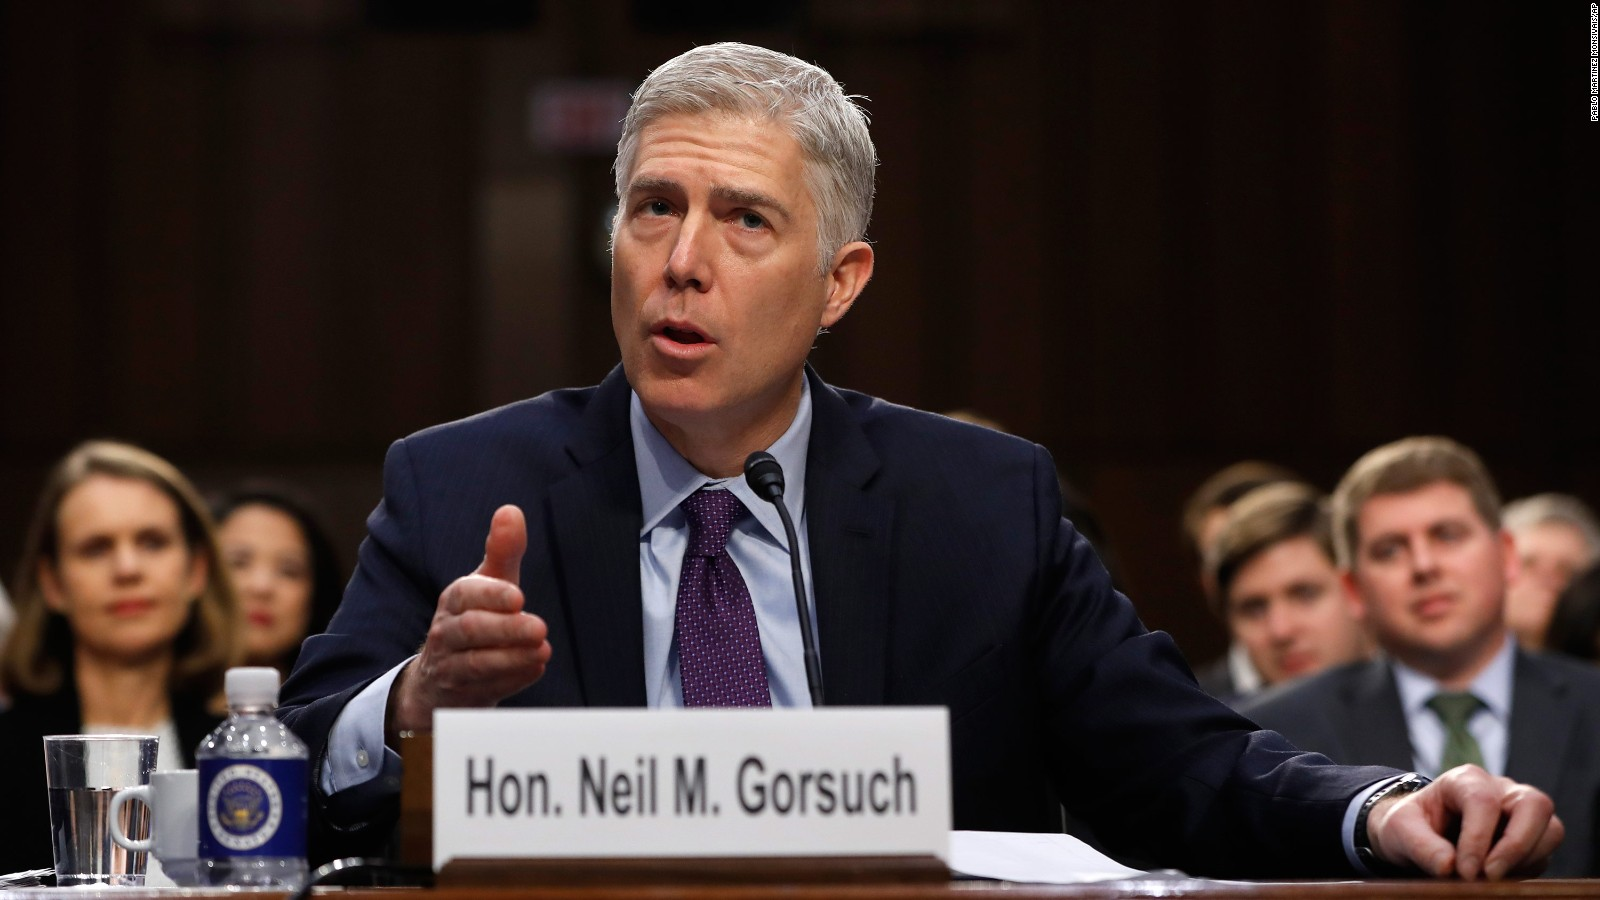 President Trump's Supreme Court nominee, Neil M. Gorsuch